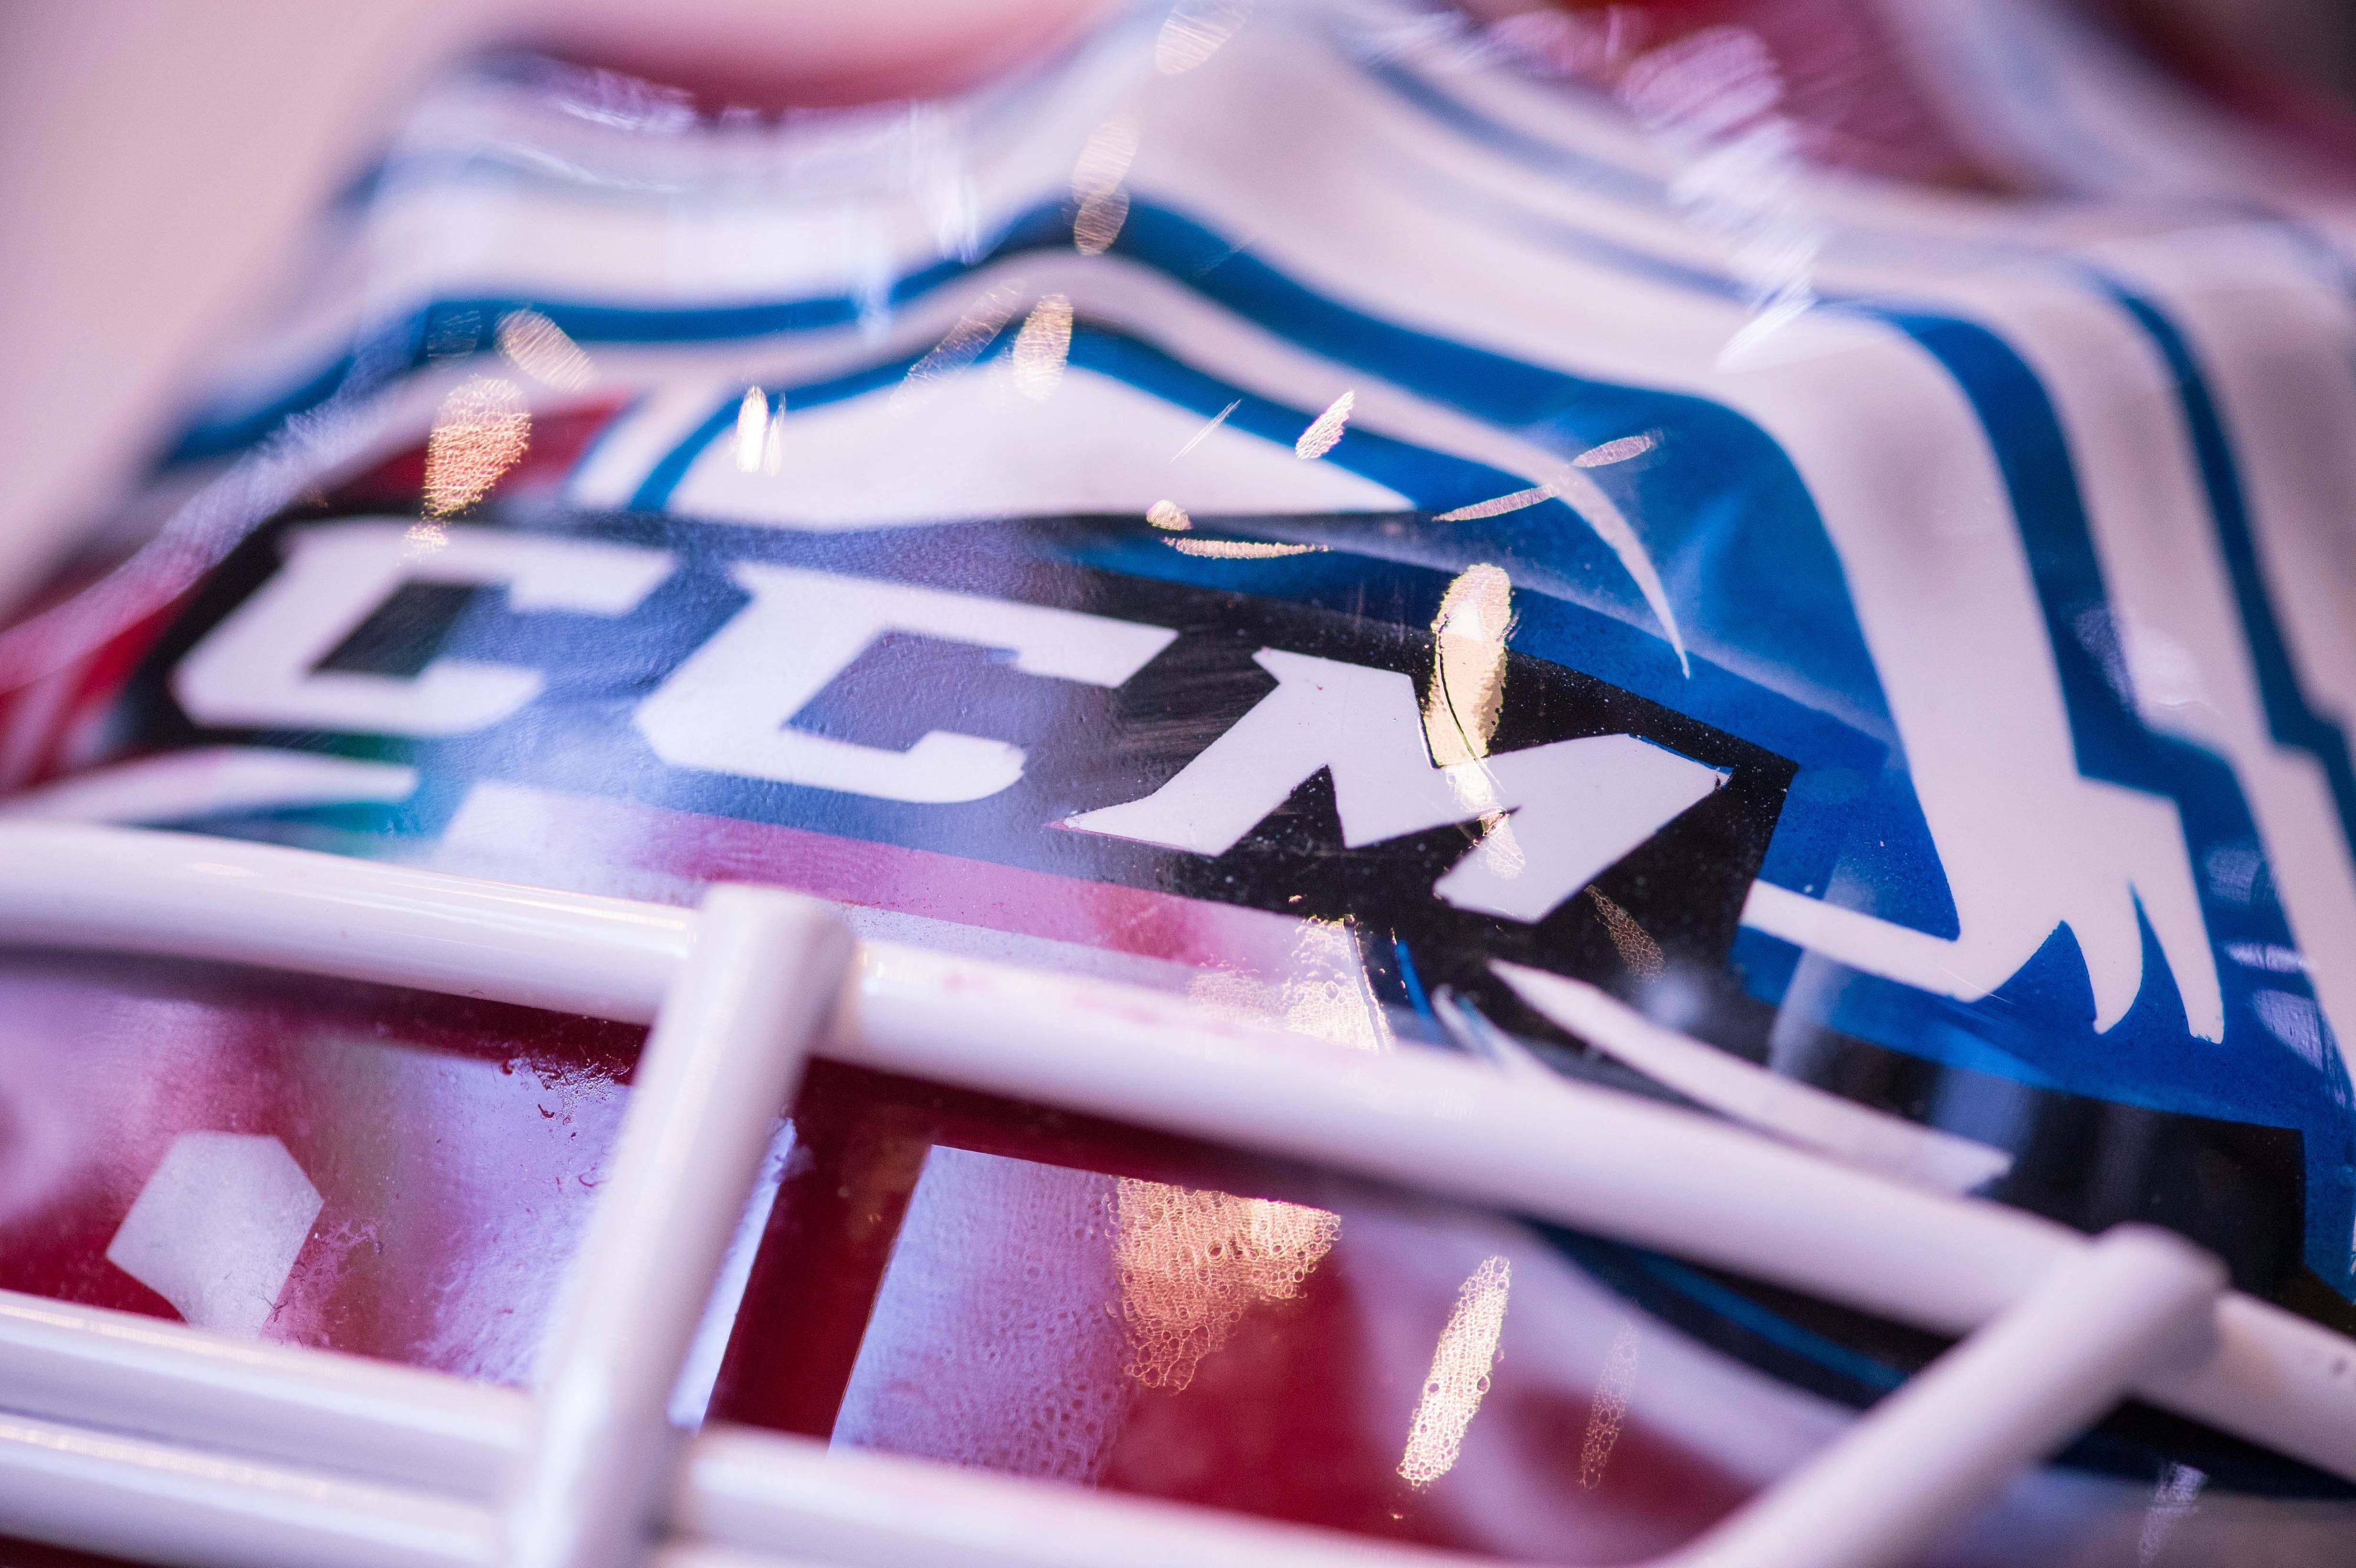 DALLAS---A close view of the CCM logo on the helmet of Colorado Avalanche goalie Jean-Sebastien Giguere, taken January 27, 2014.